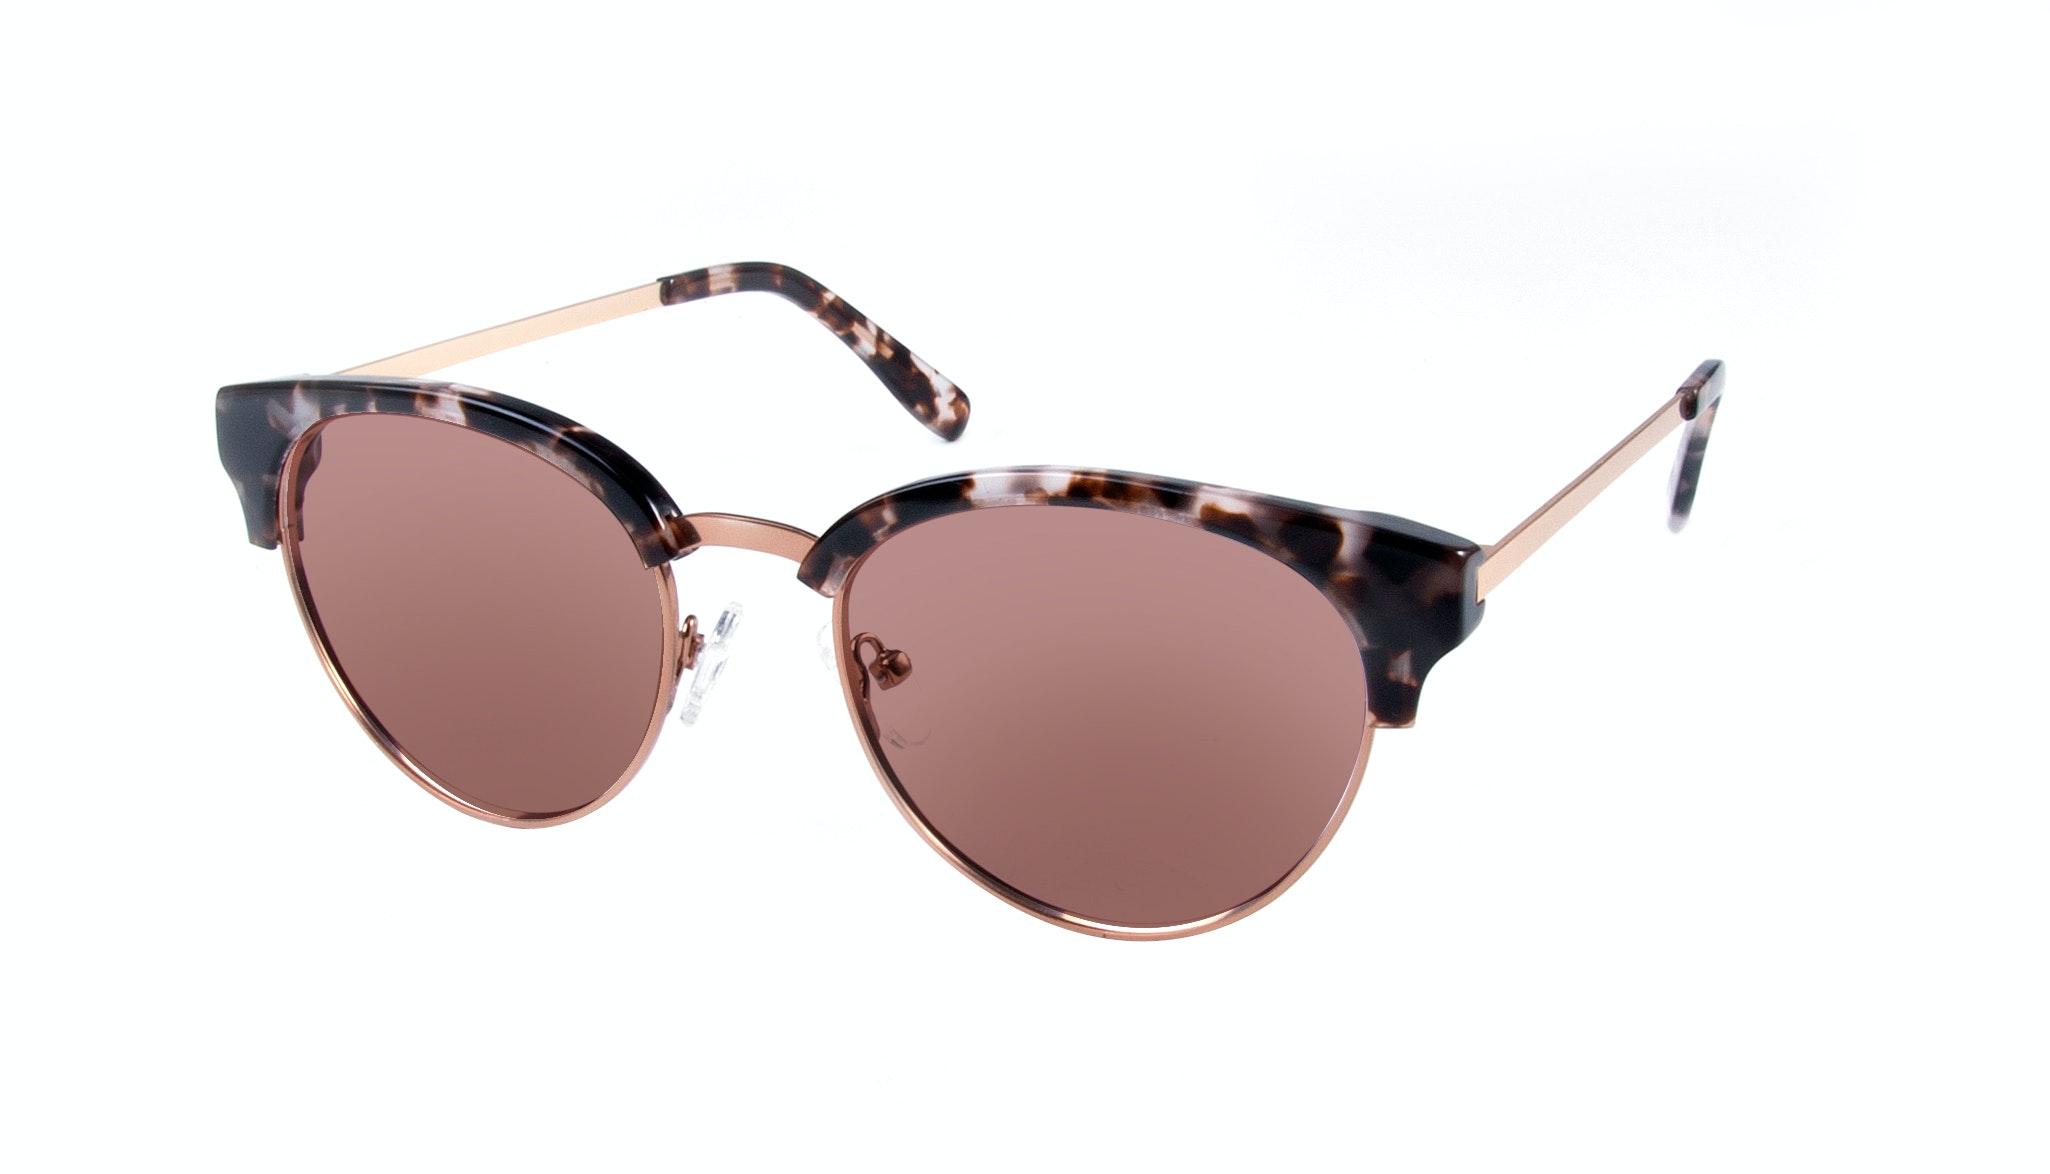 Affordable Fashion Glasses Round Sunglasses Women Allure Mocha Tortoise Tilt